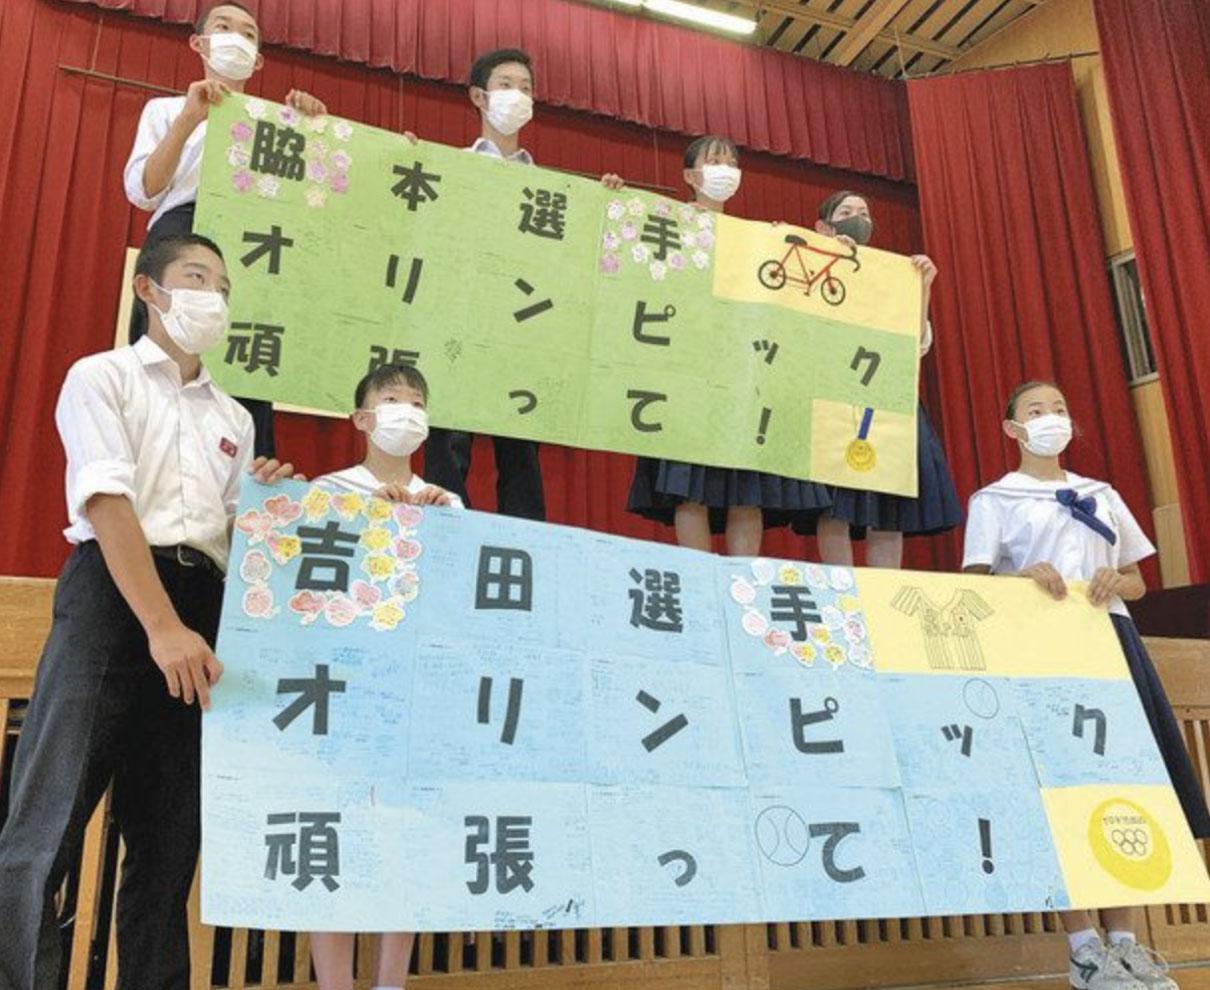 先輩 金メダル取って 野球・吉田正尚選手 自転車・脇本雄太選手